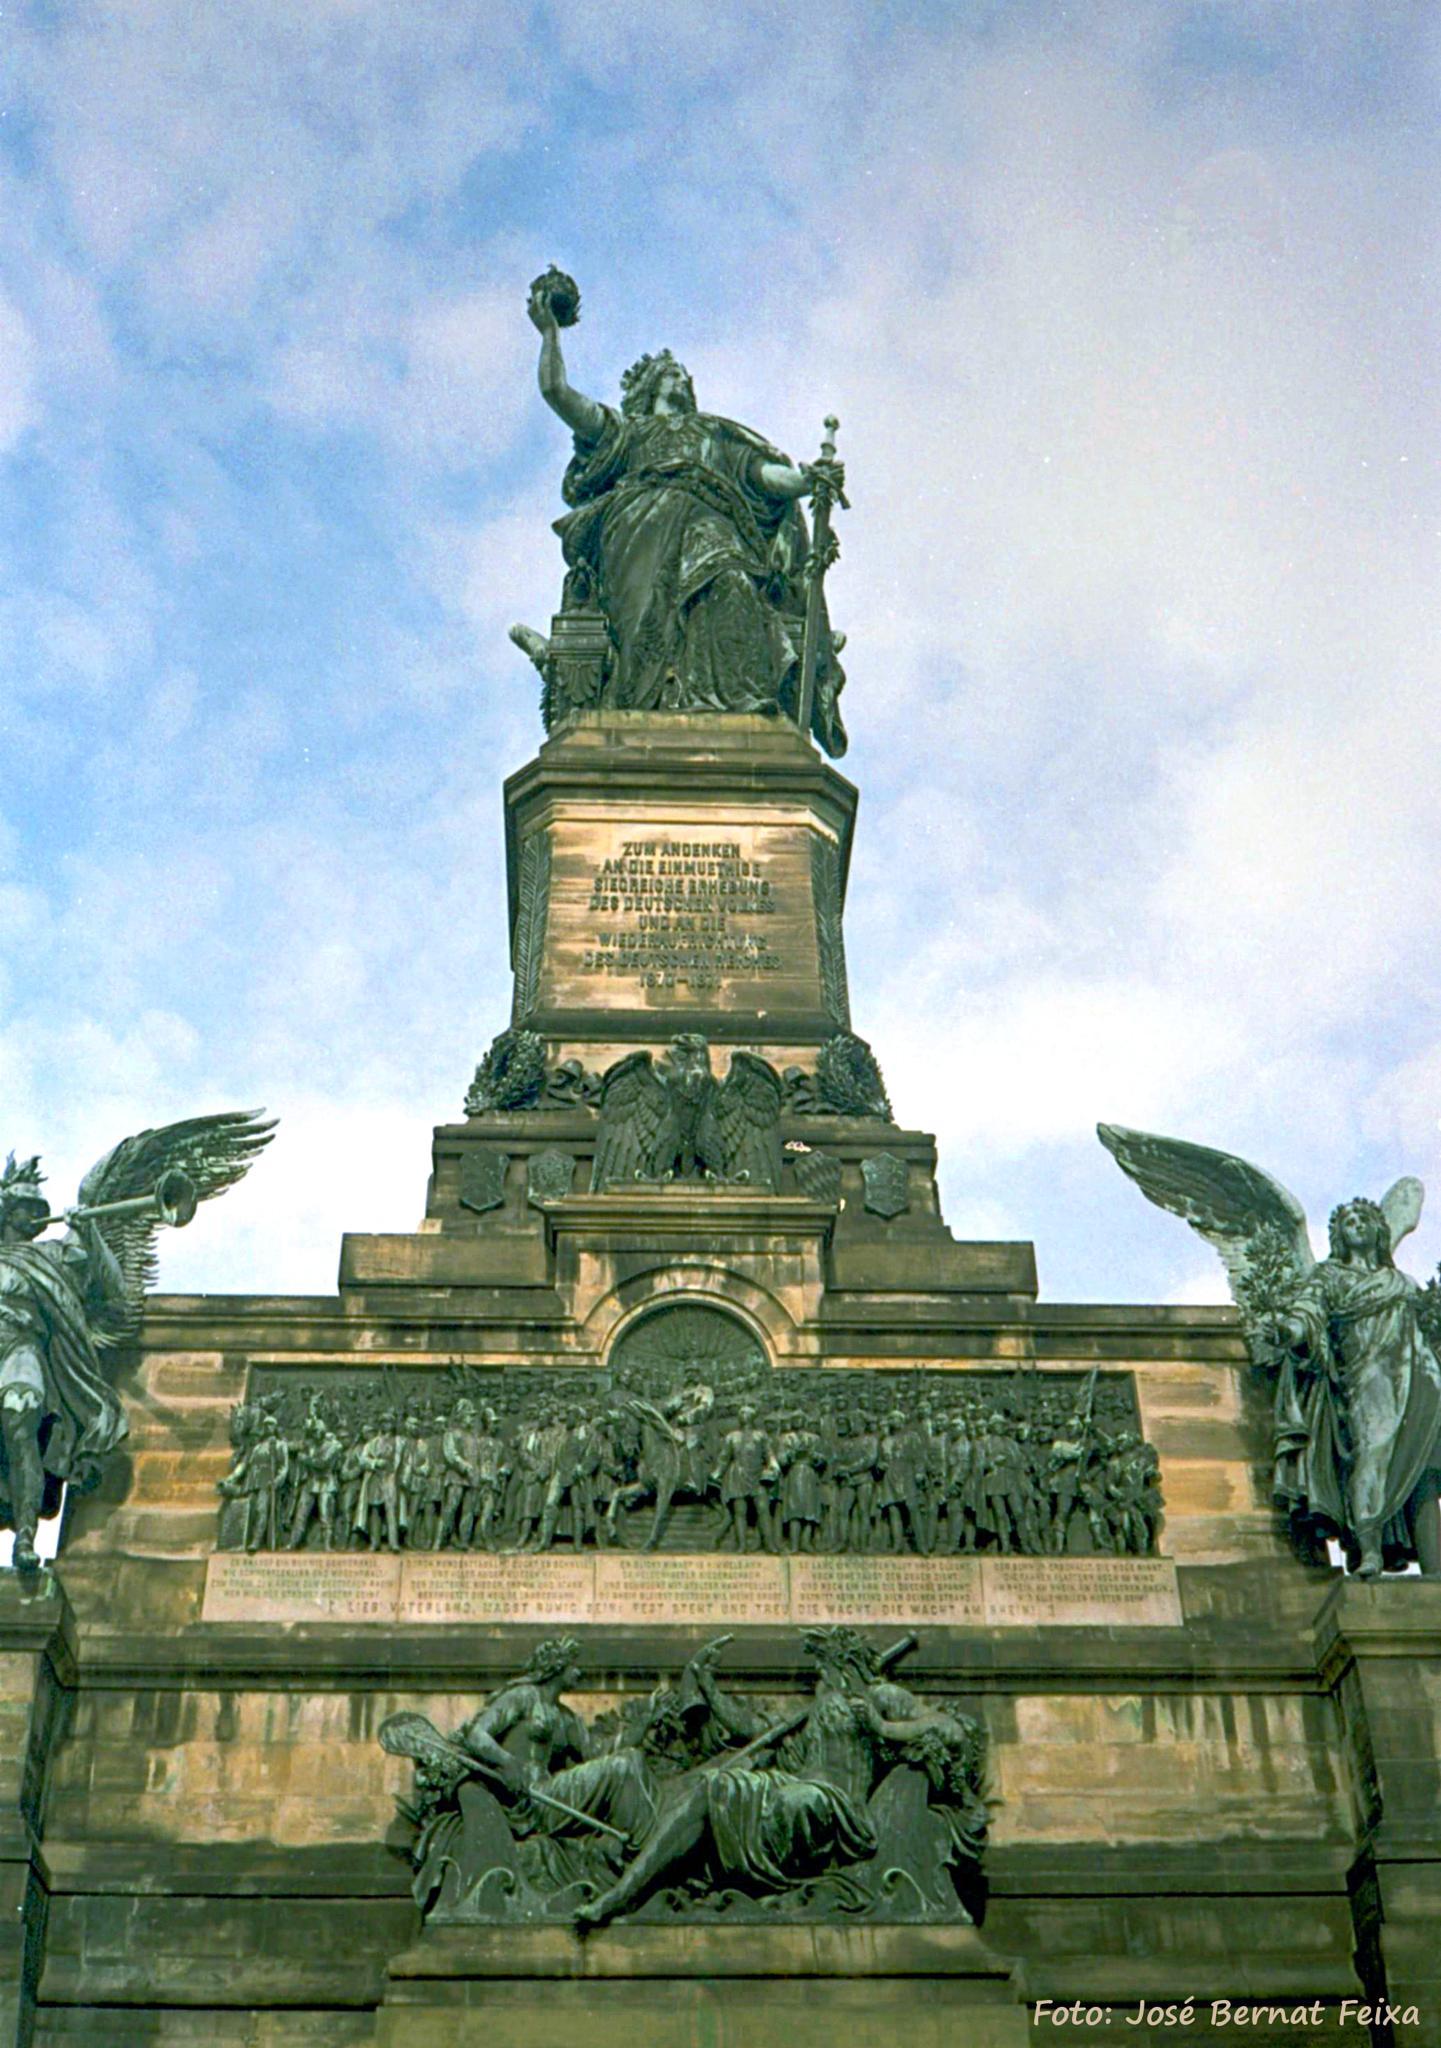 Niederwald monument by José Bernat Feixa